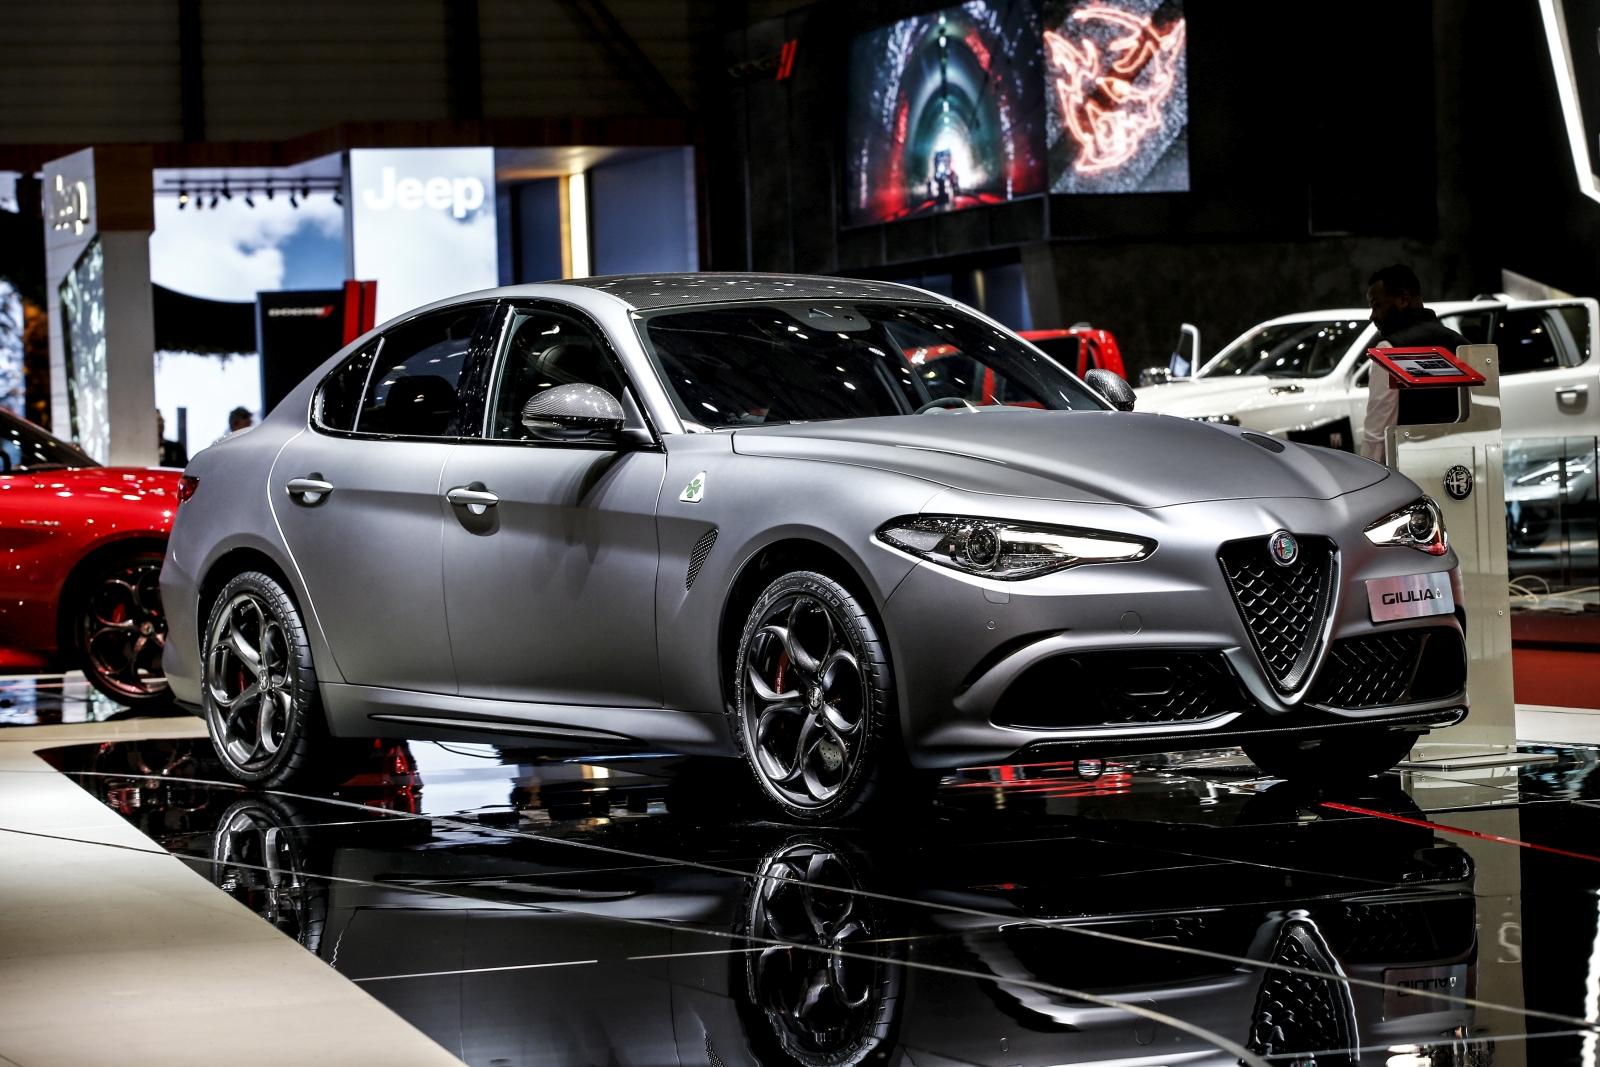 Alfa Romeo Giulia és Stelvio Quadrifoglio NRING